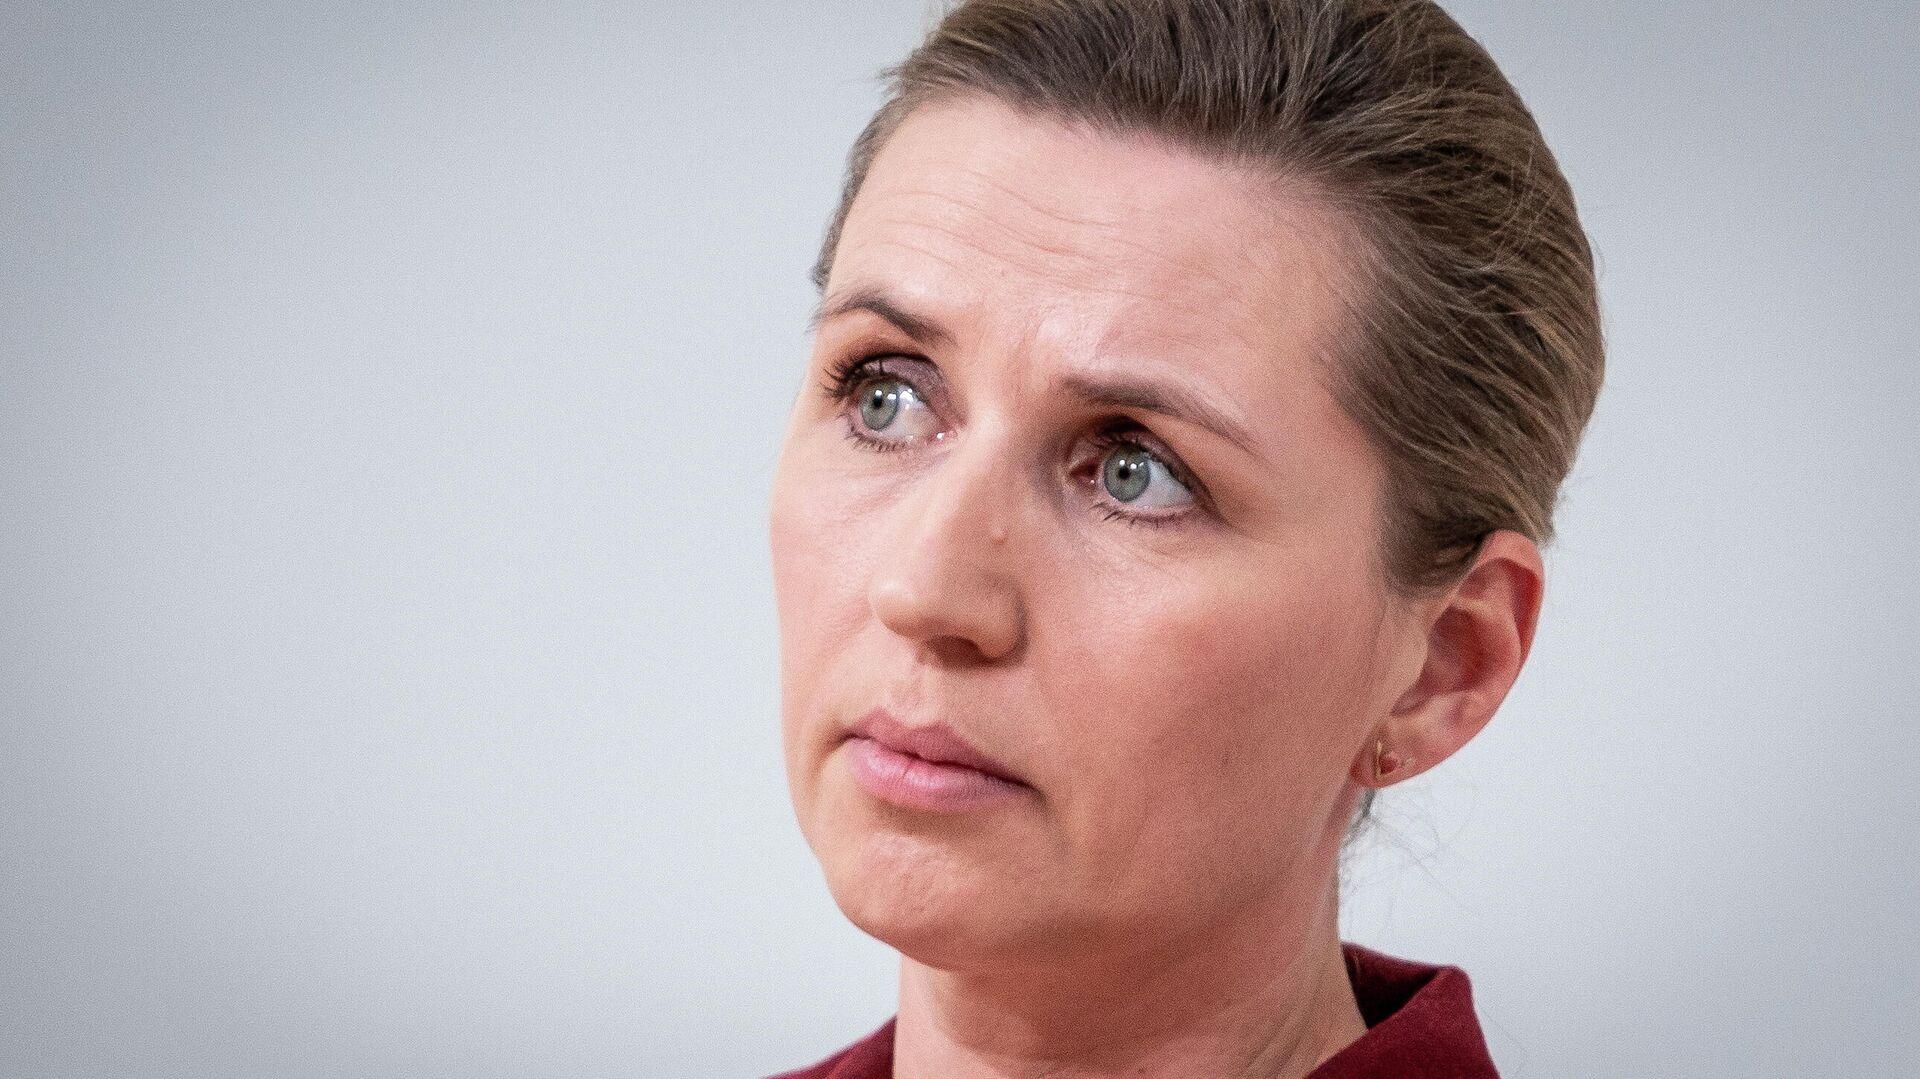 Mette Frederiksen, la primera ministra de Dinamarca - Sputnik Mundo, 1920, 22.03.2021